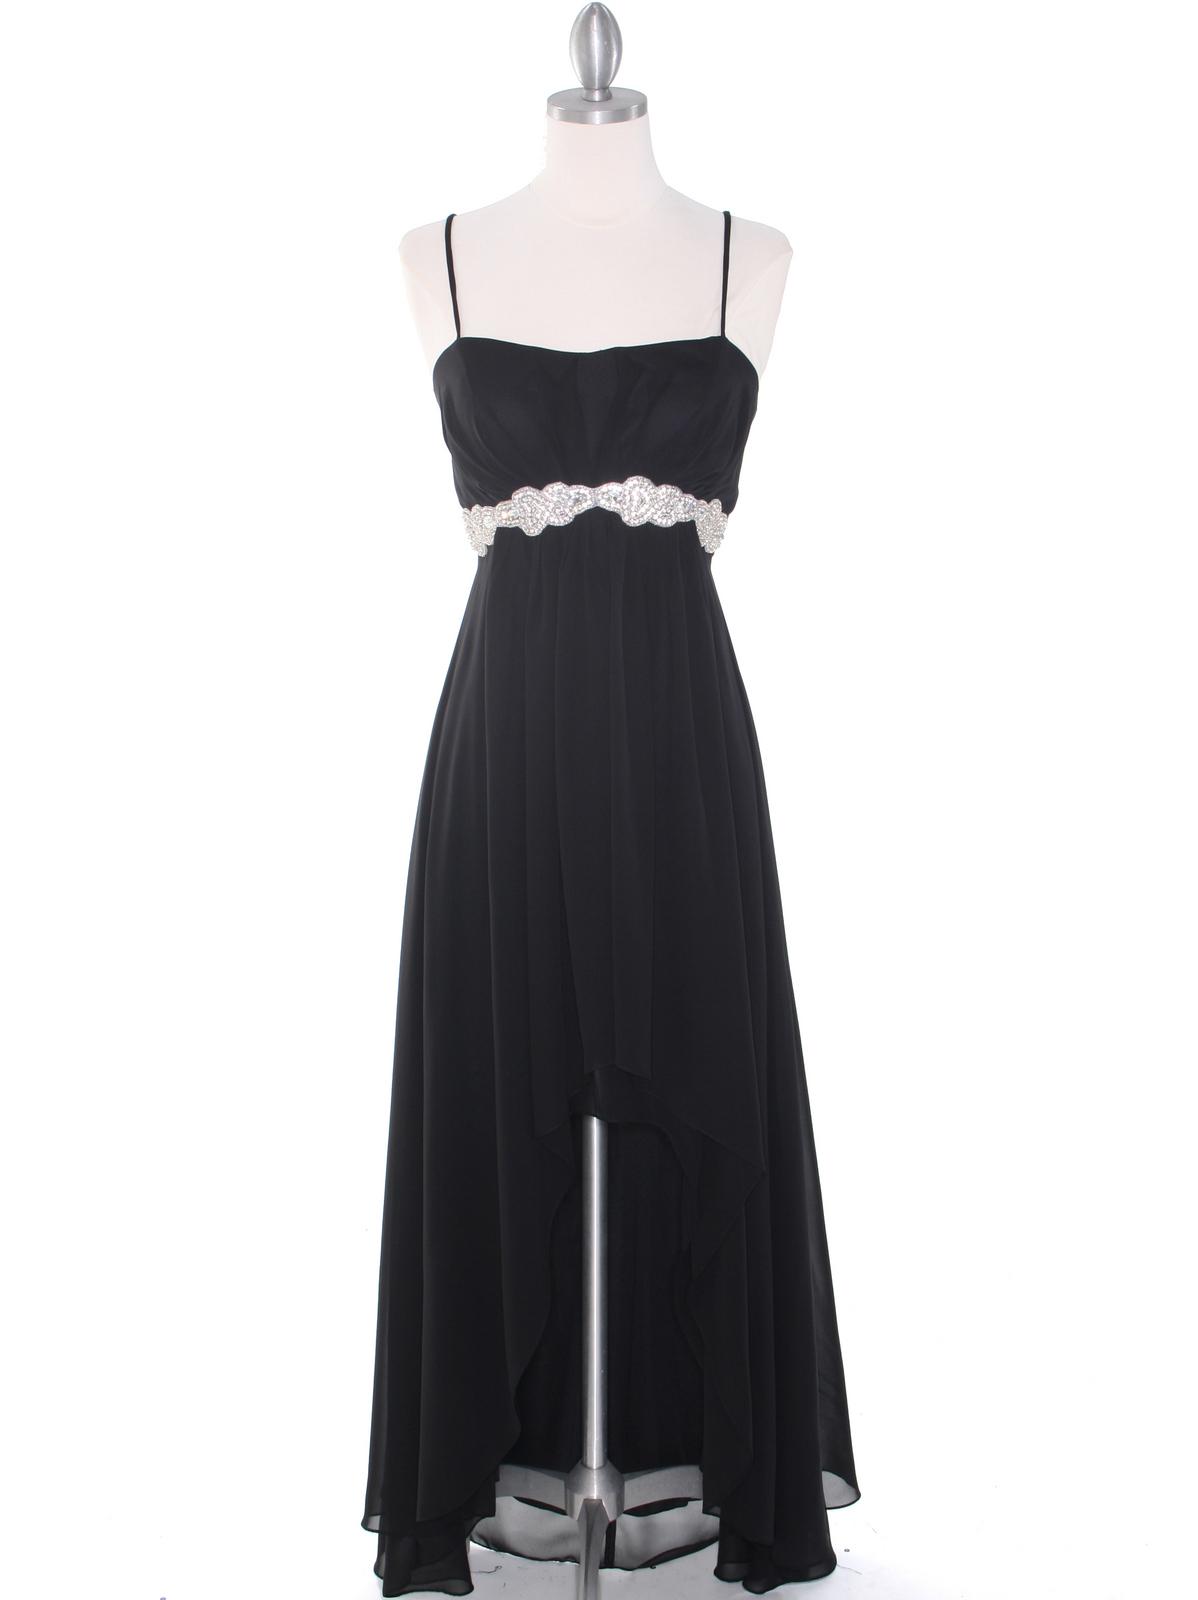 7653b6af3a E1913 High Low Chiffon Cocktail Dress - Black